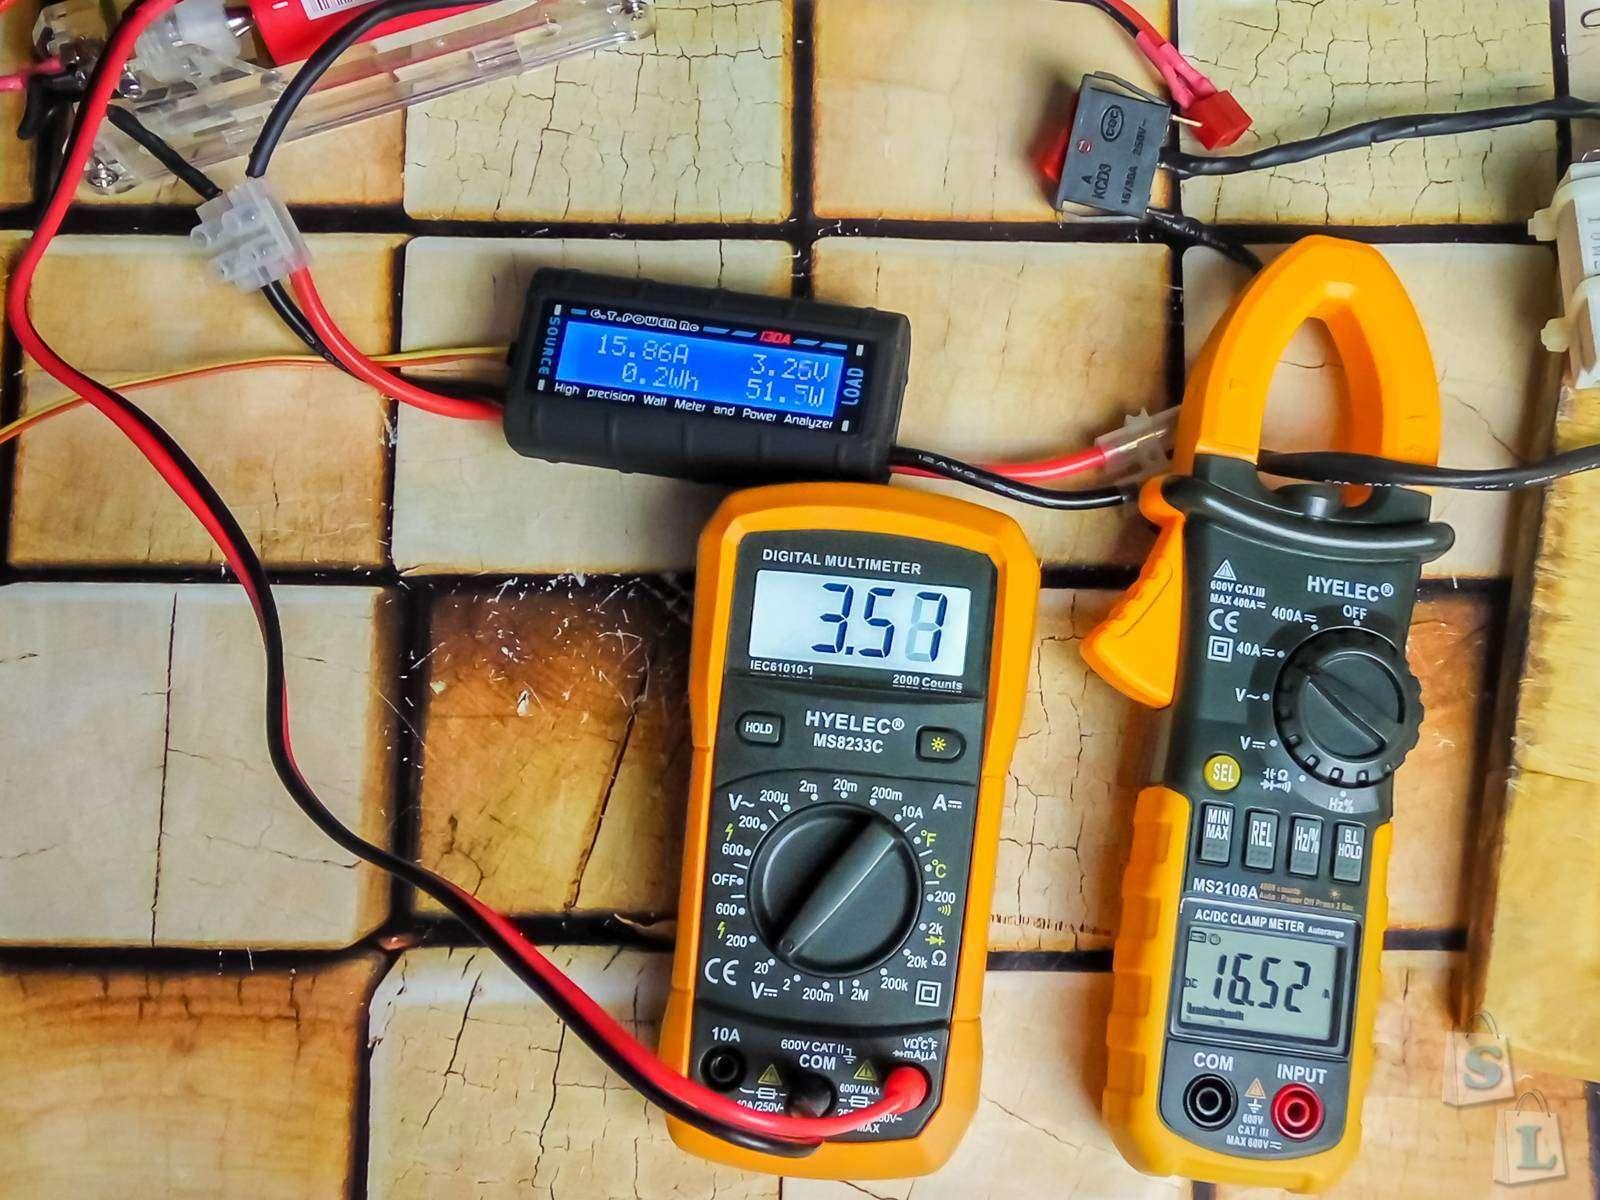 Aliexpress: Измеритель мощности Gtpower RC, 60 В 130 А